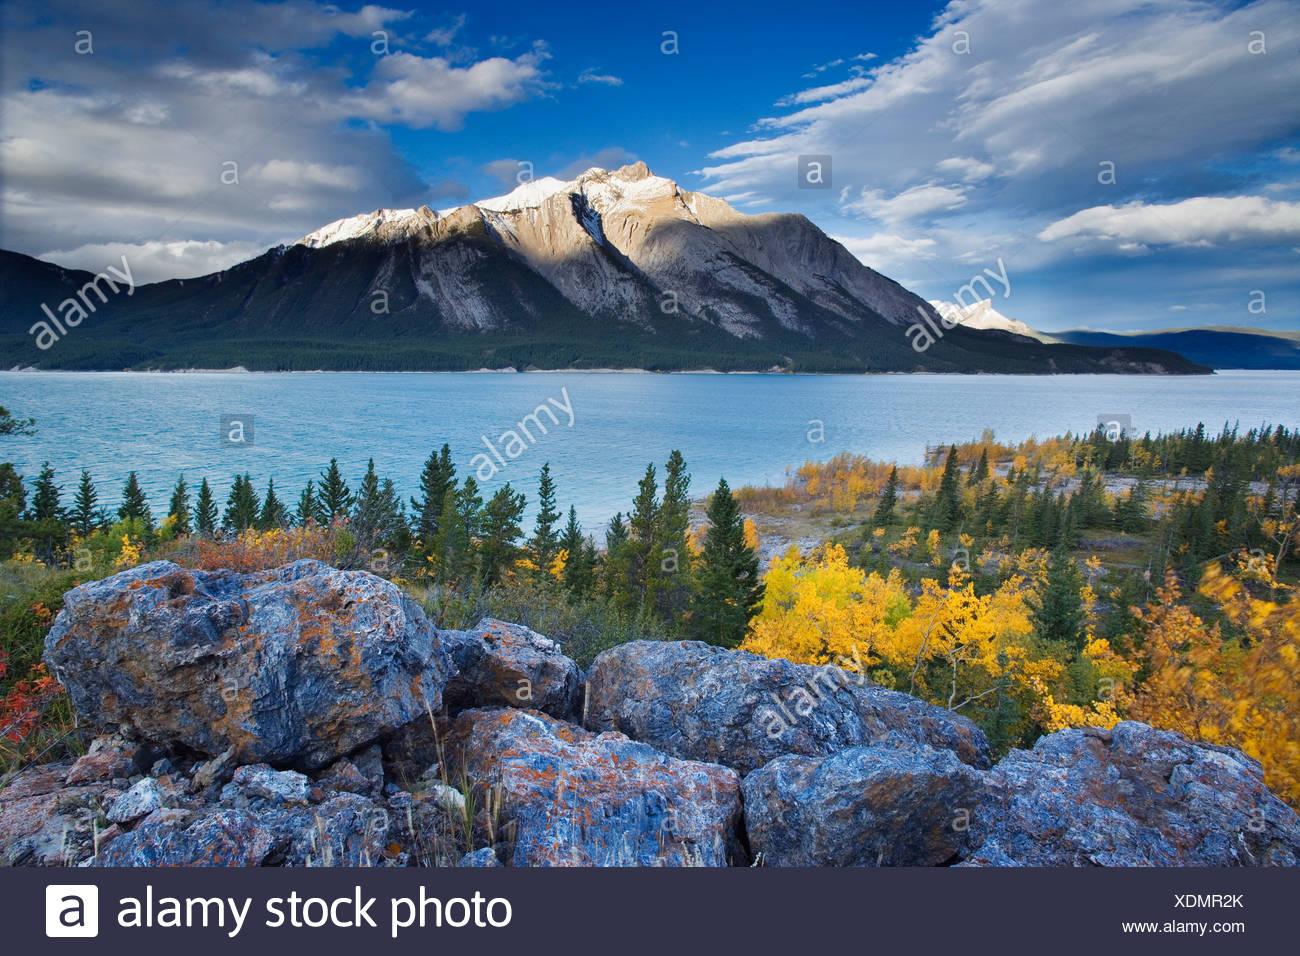 Lake Abraham and Mount Michener, Kootenay Plains, Alberta, Canada - Stock Image